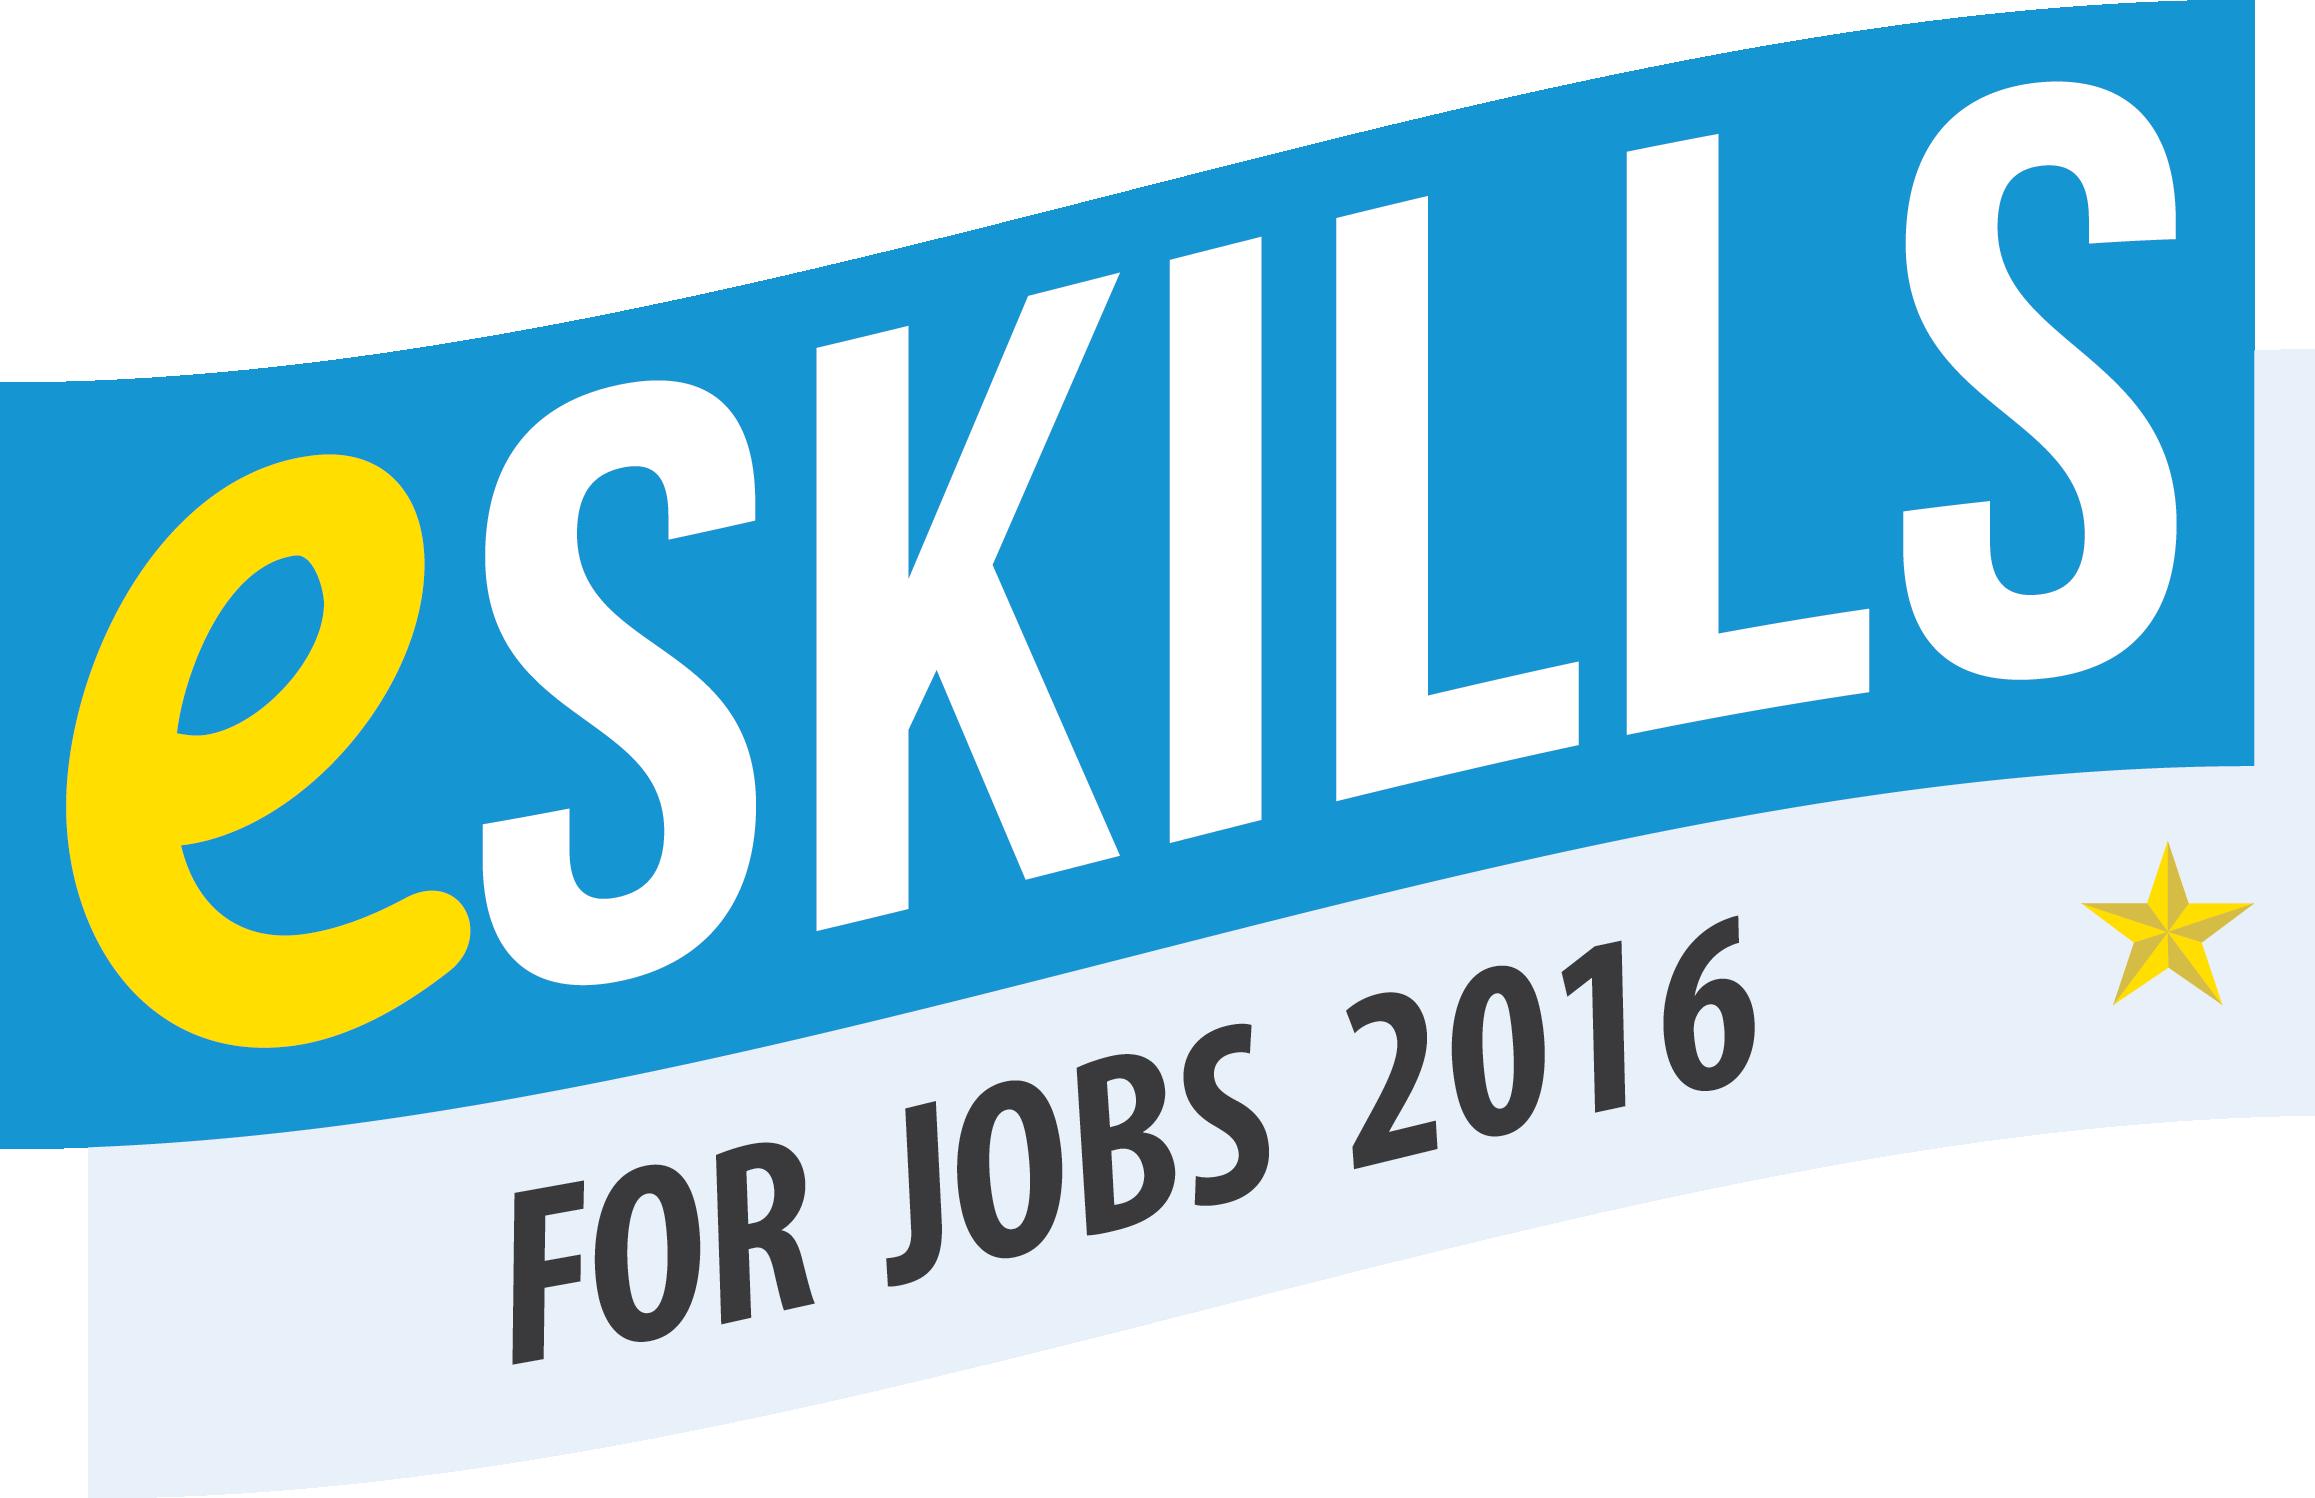 eSkills for Jobs campaign logo